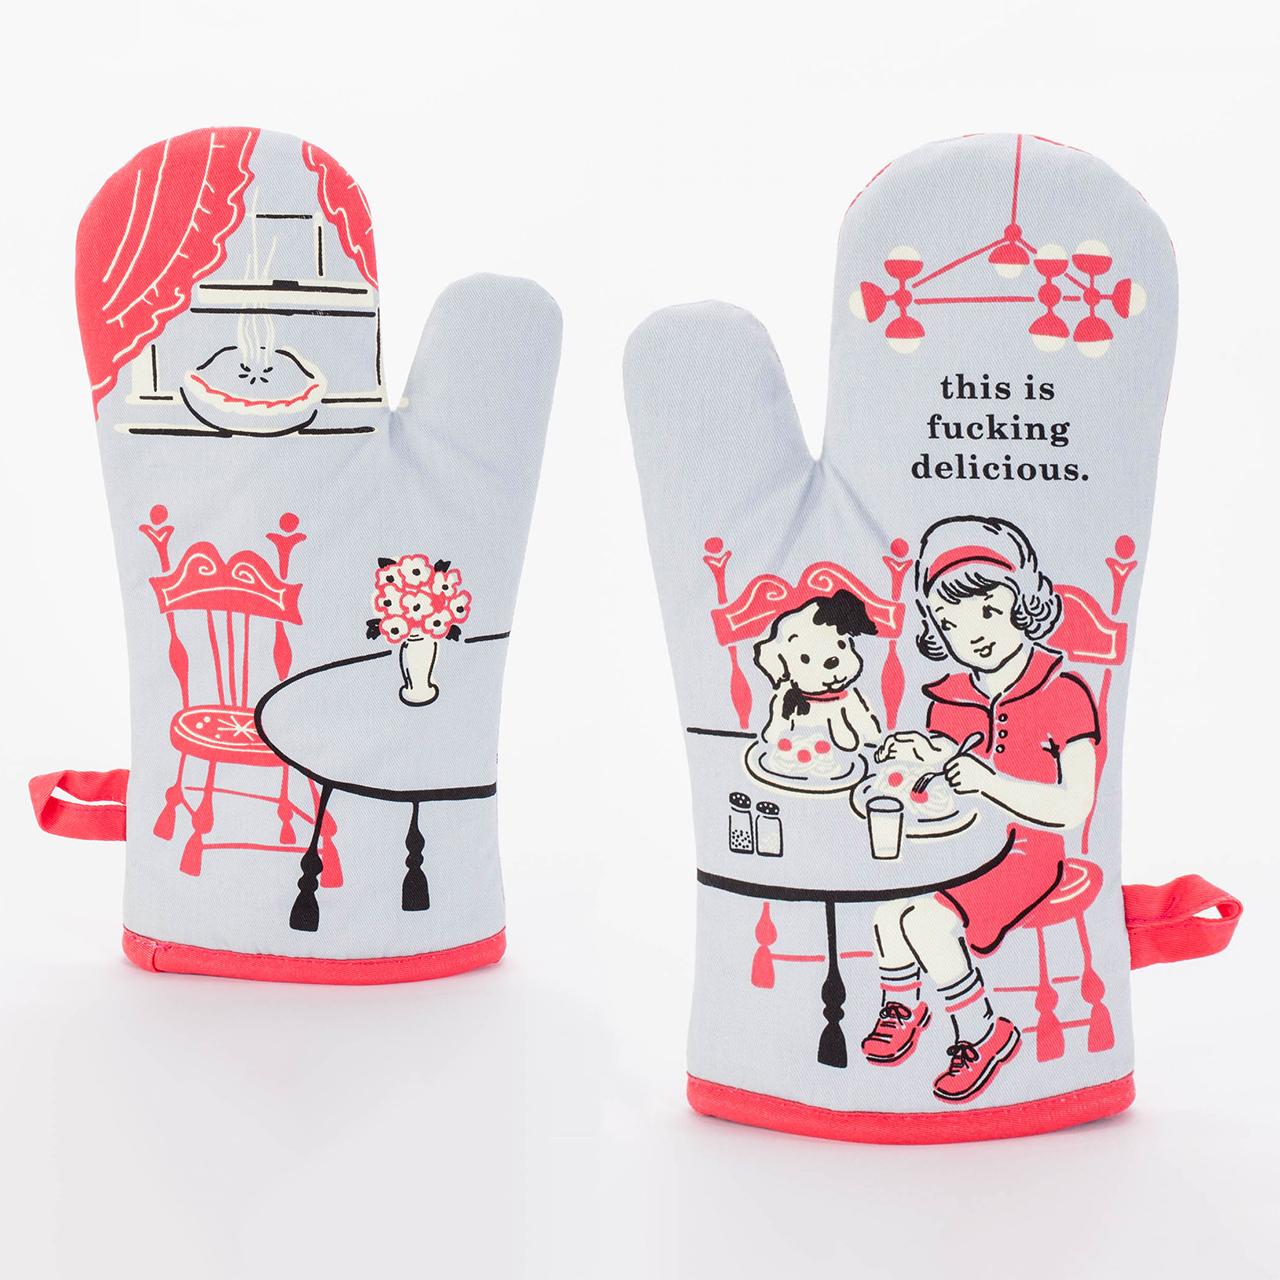 Pot Glove Kitchen Novelty Home Gift Blue Q /'You/'re Beautiful /' Oven Mitt